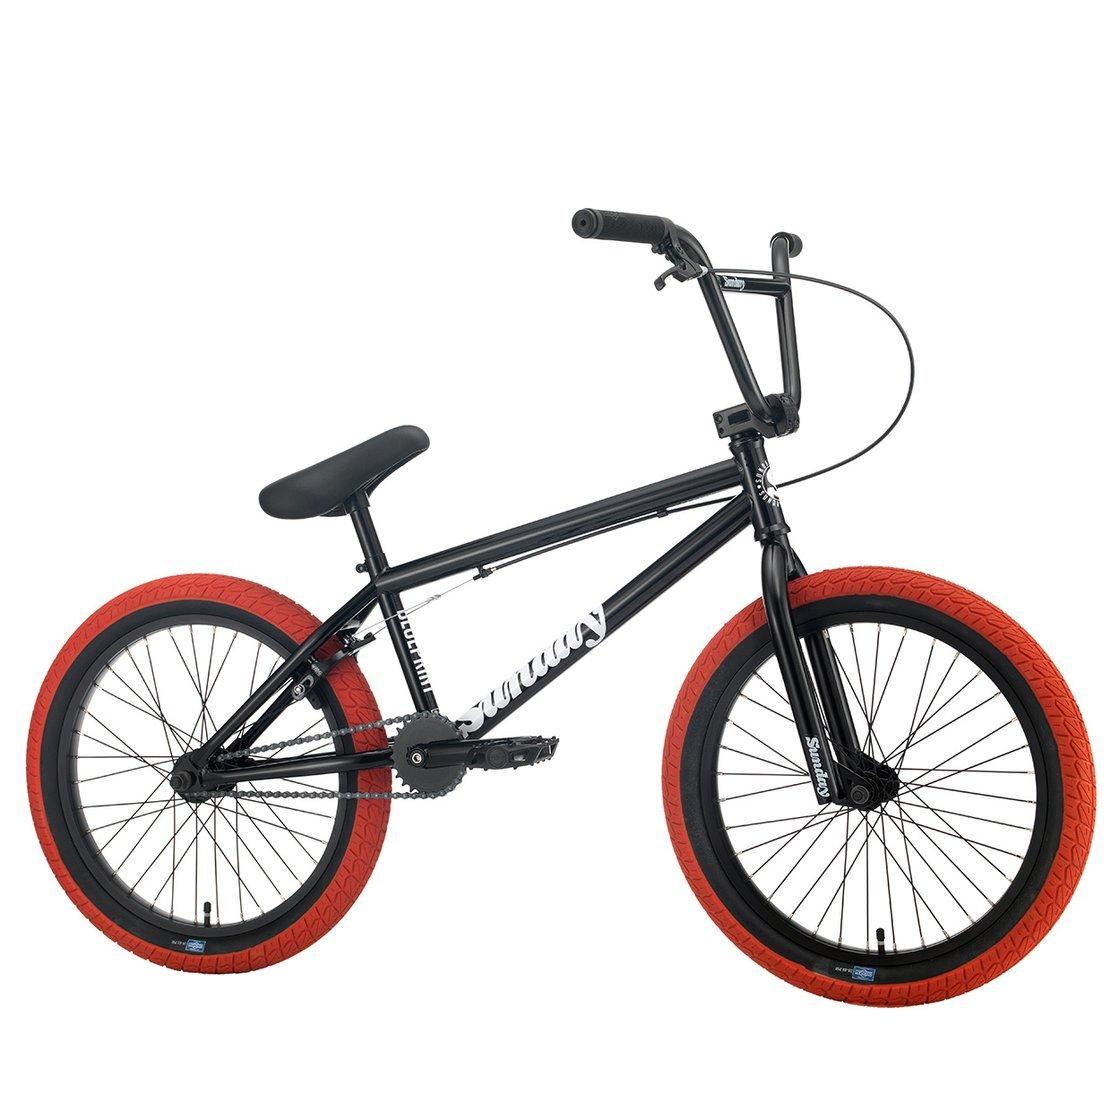 Sunday Blueprint 2021 Bici Bmx | Colore Nero/Rosso